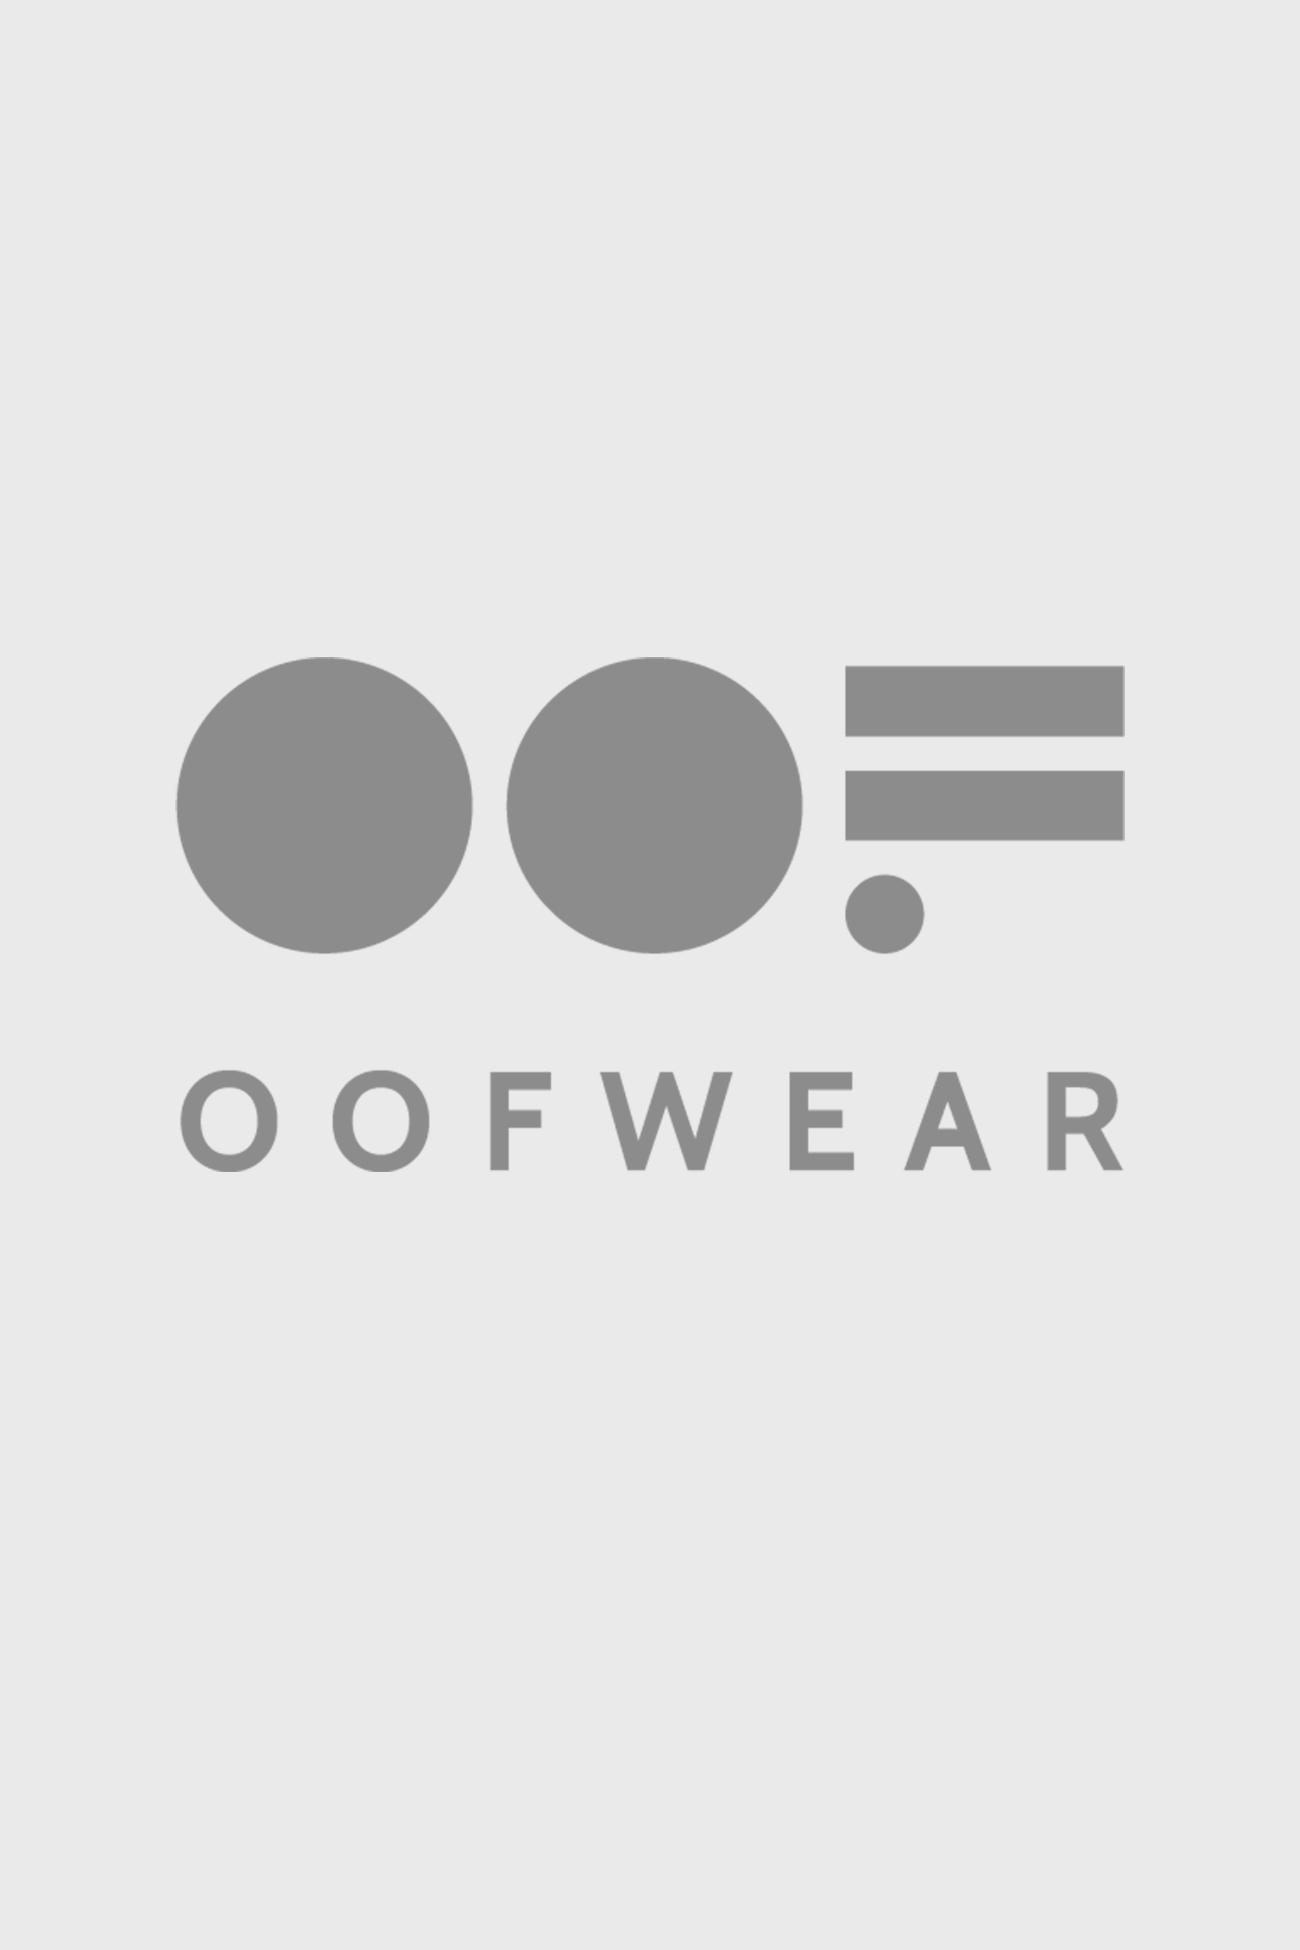 Men's shirt-style jacket in midnight blue cotton blend